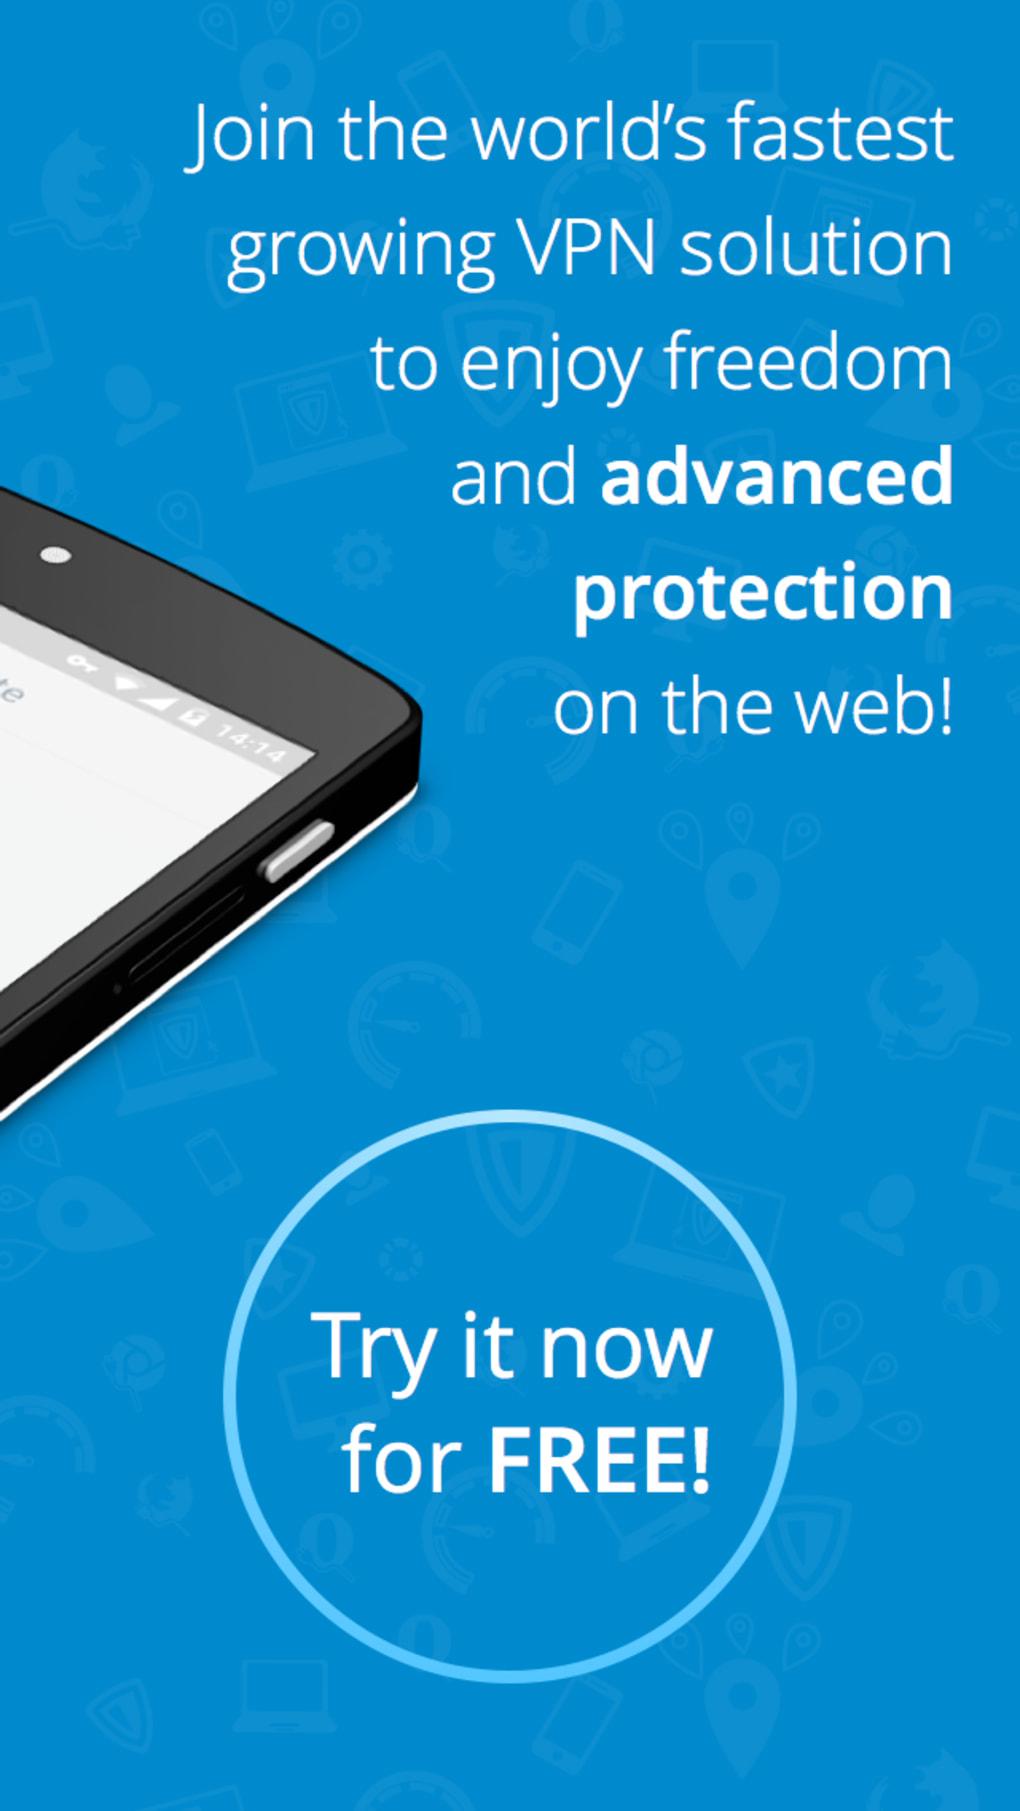 Descargar hola free vpn gratis para android